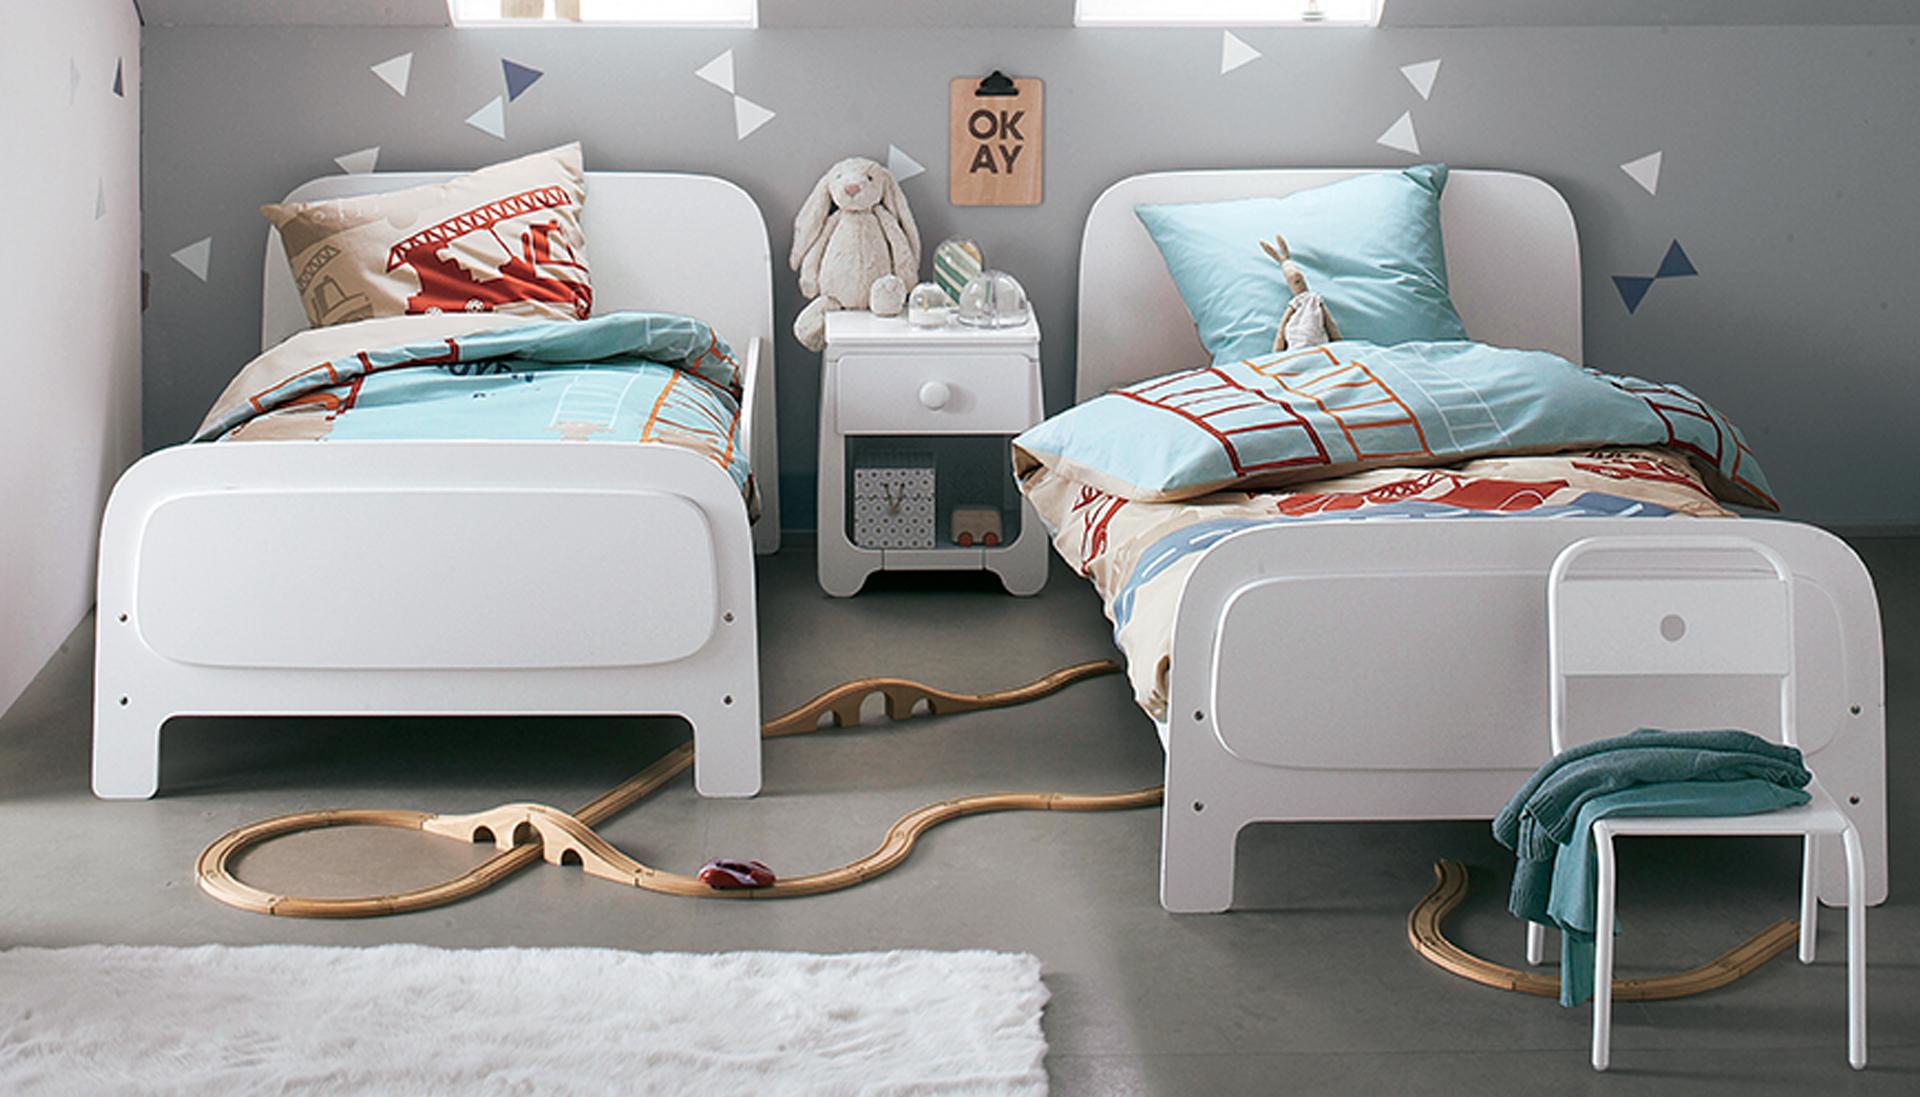 unistudio_verbaudet_pastille_meubles_chambre_enfant-design_sketch_creativite_1